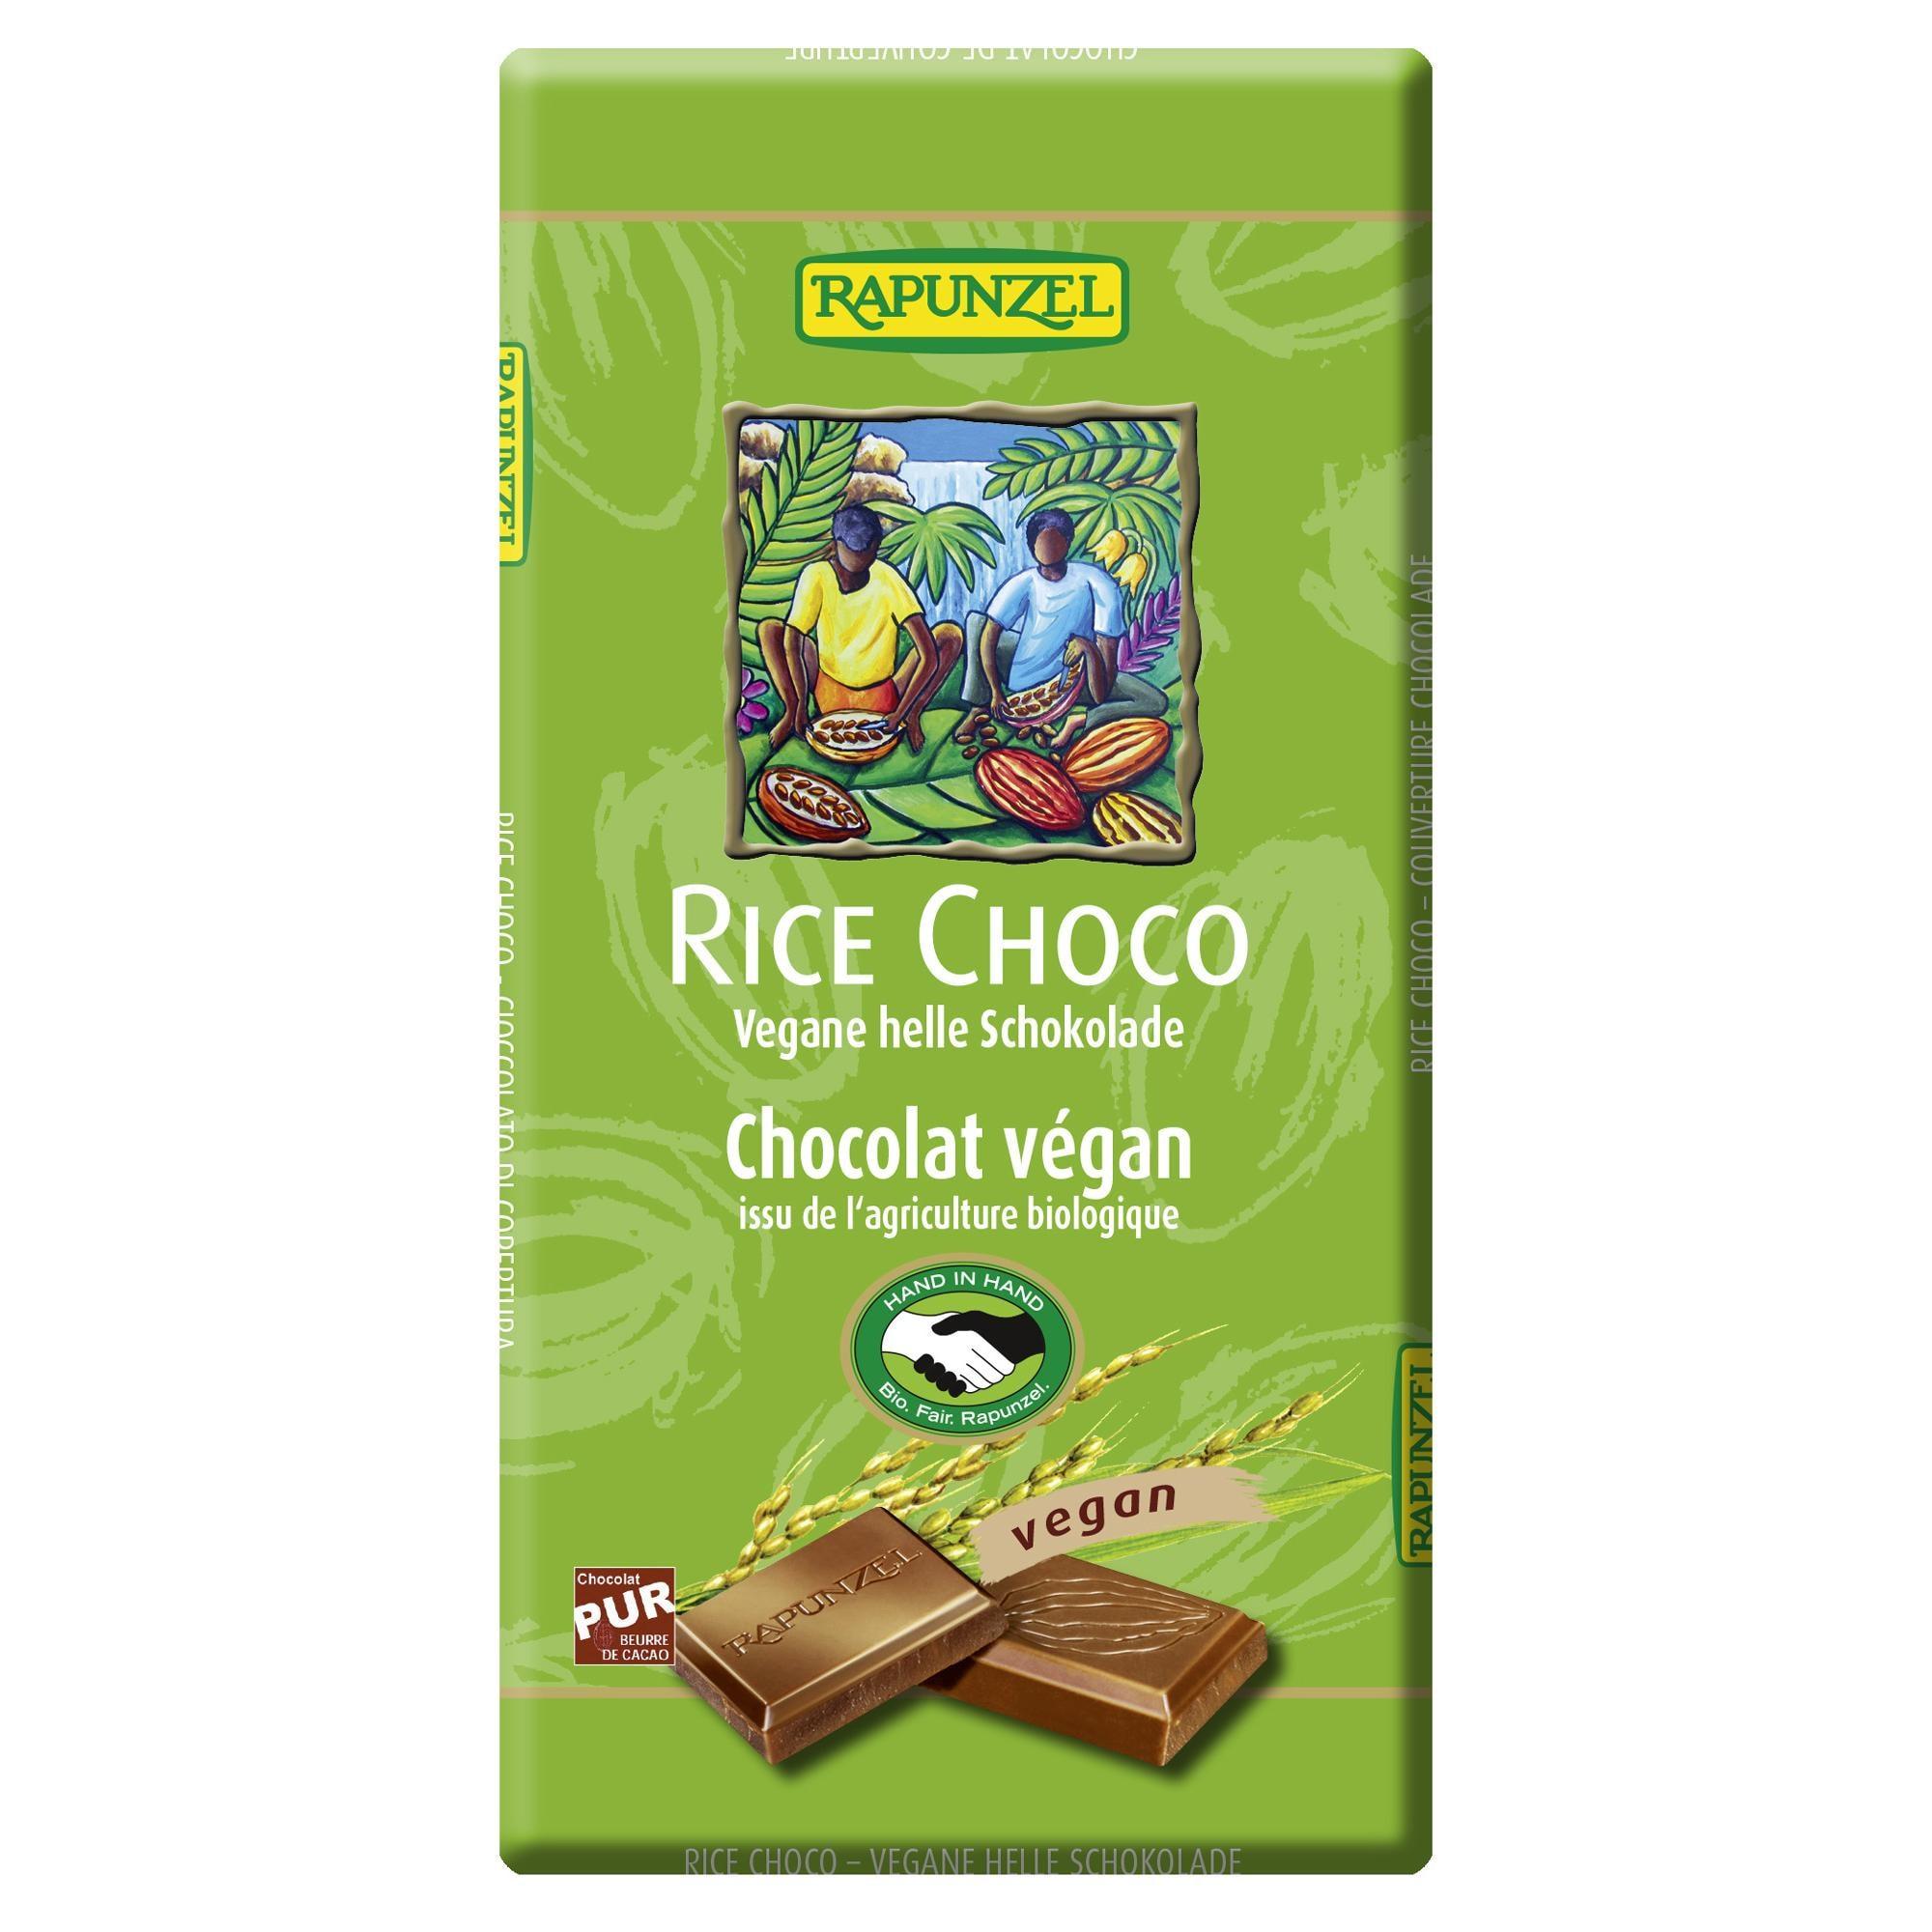 Rapunzel Bio Rice Choco vegane helle Schokolade 100g